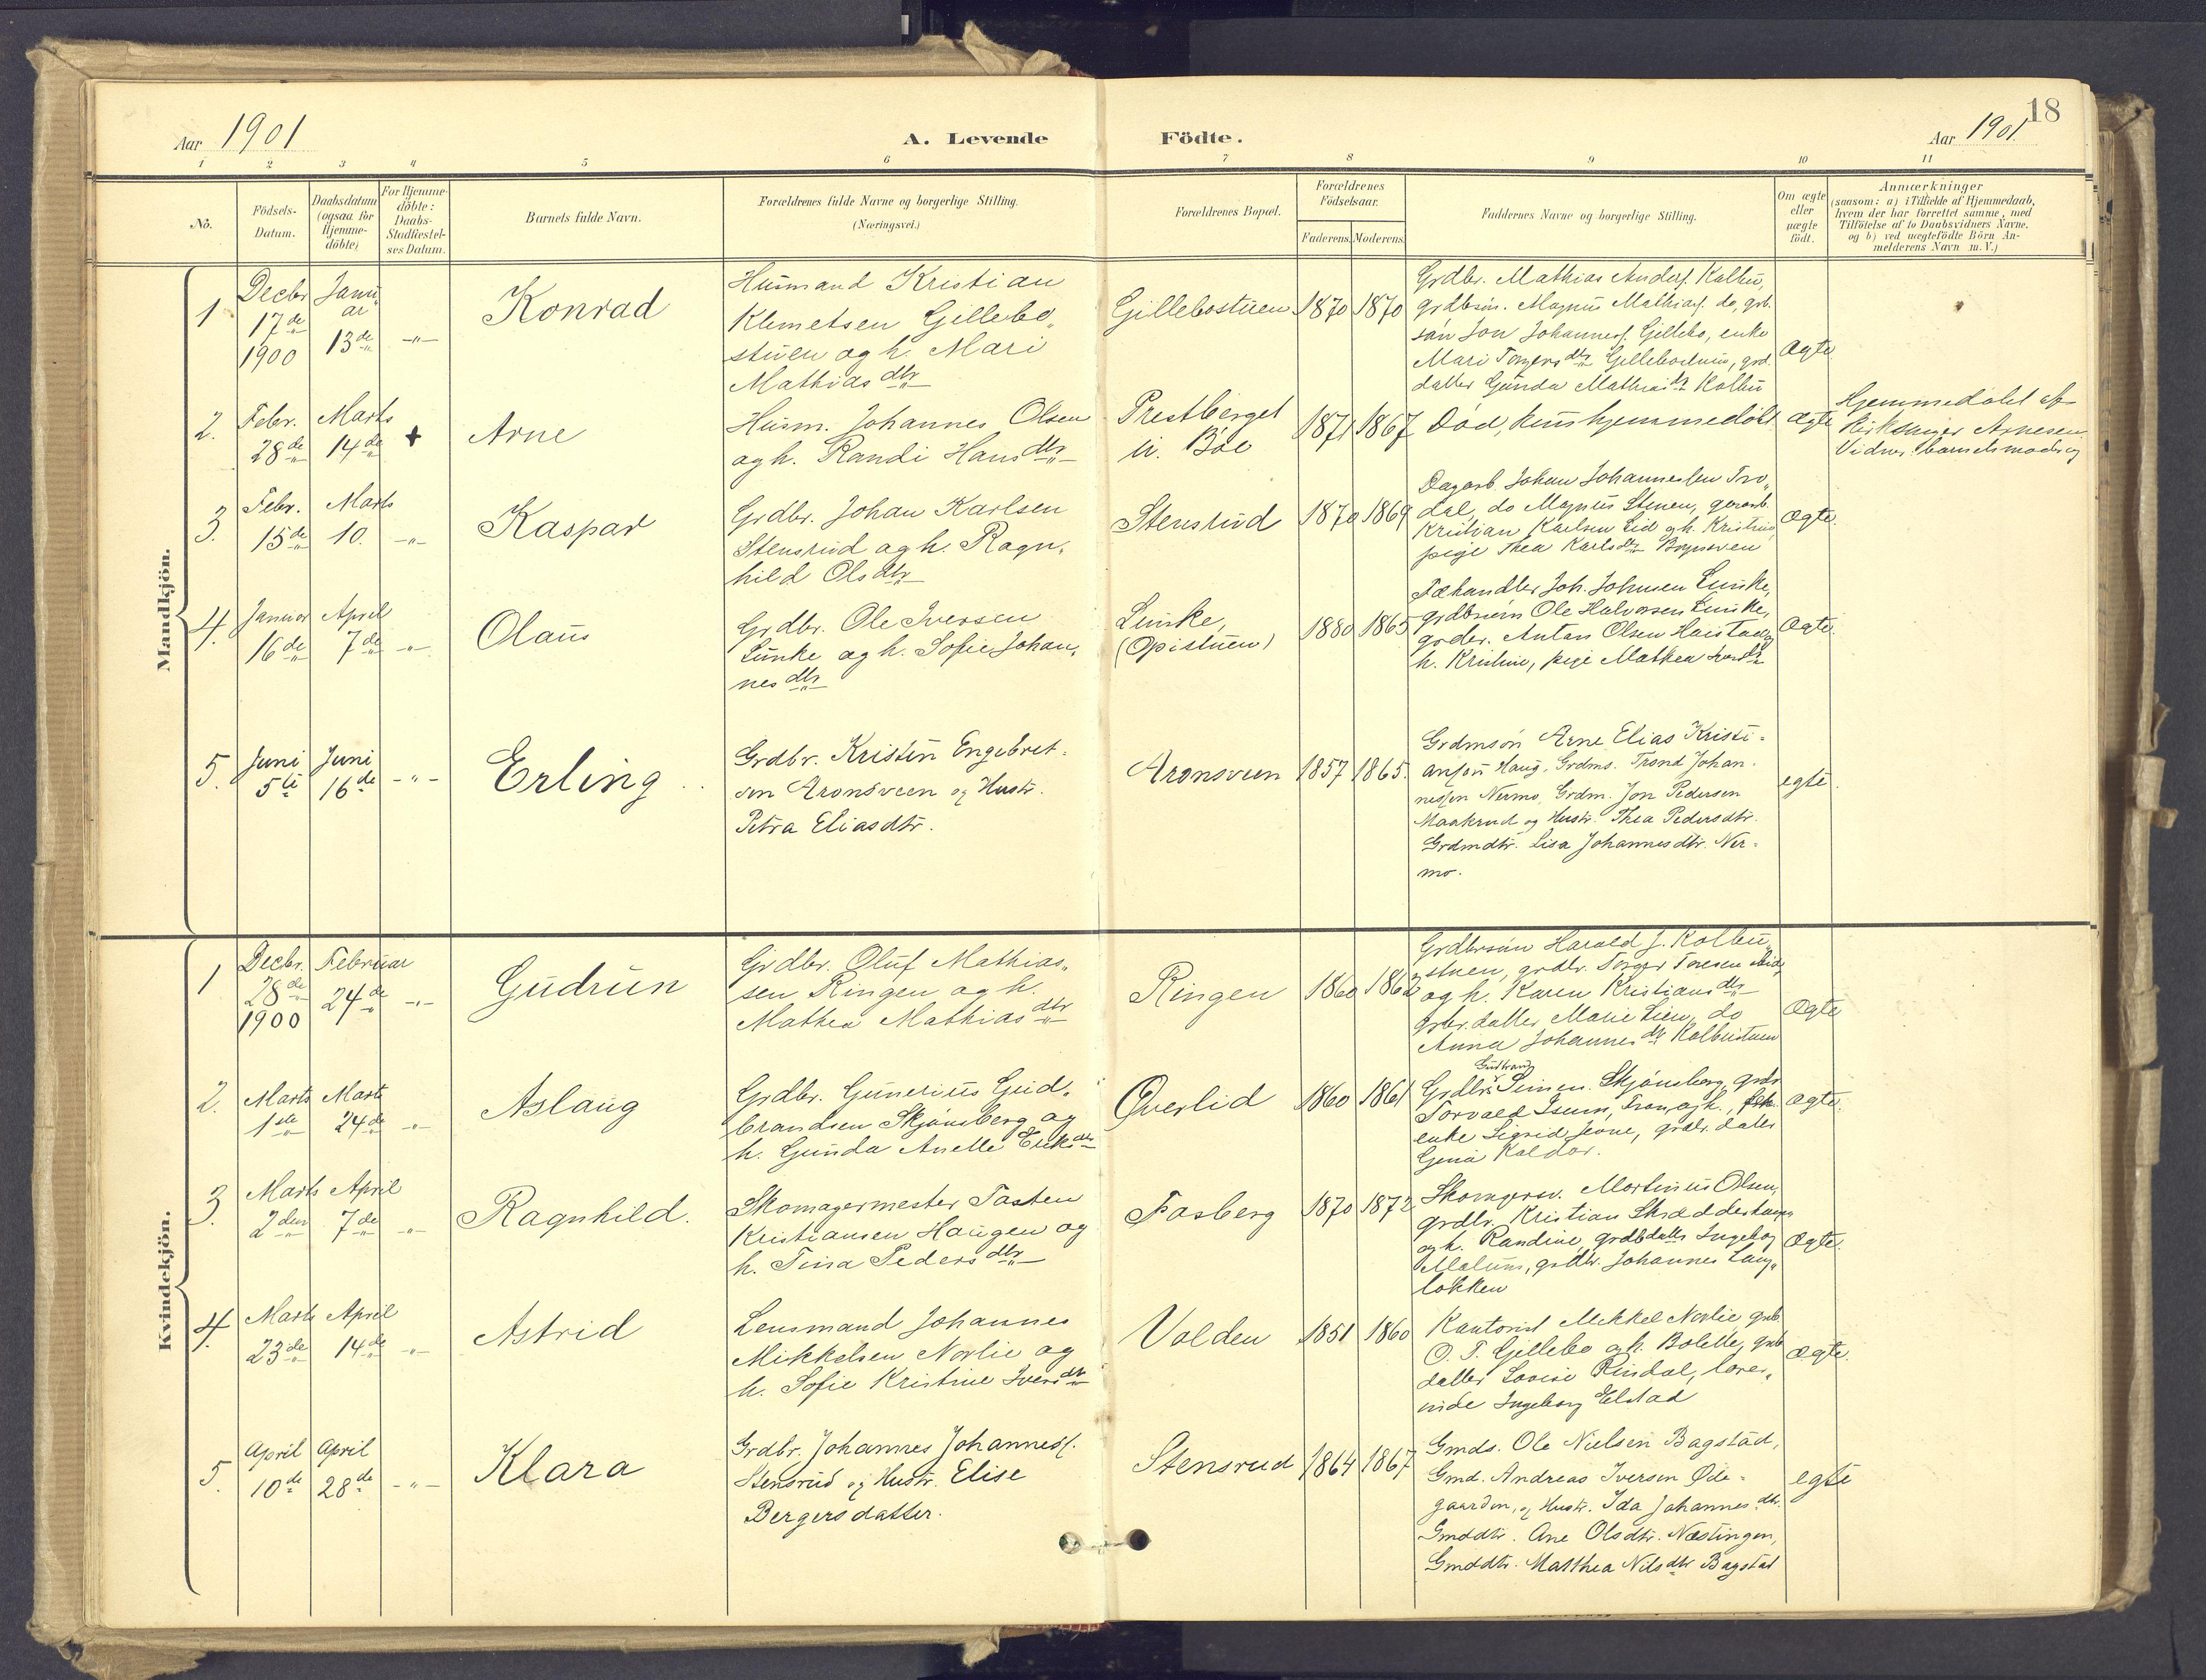 SAH, Øyer prestekontor, Ministerialbok nr. 12, 1897-1920, s. 18